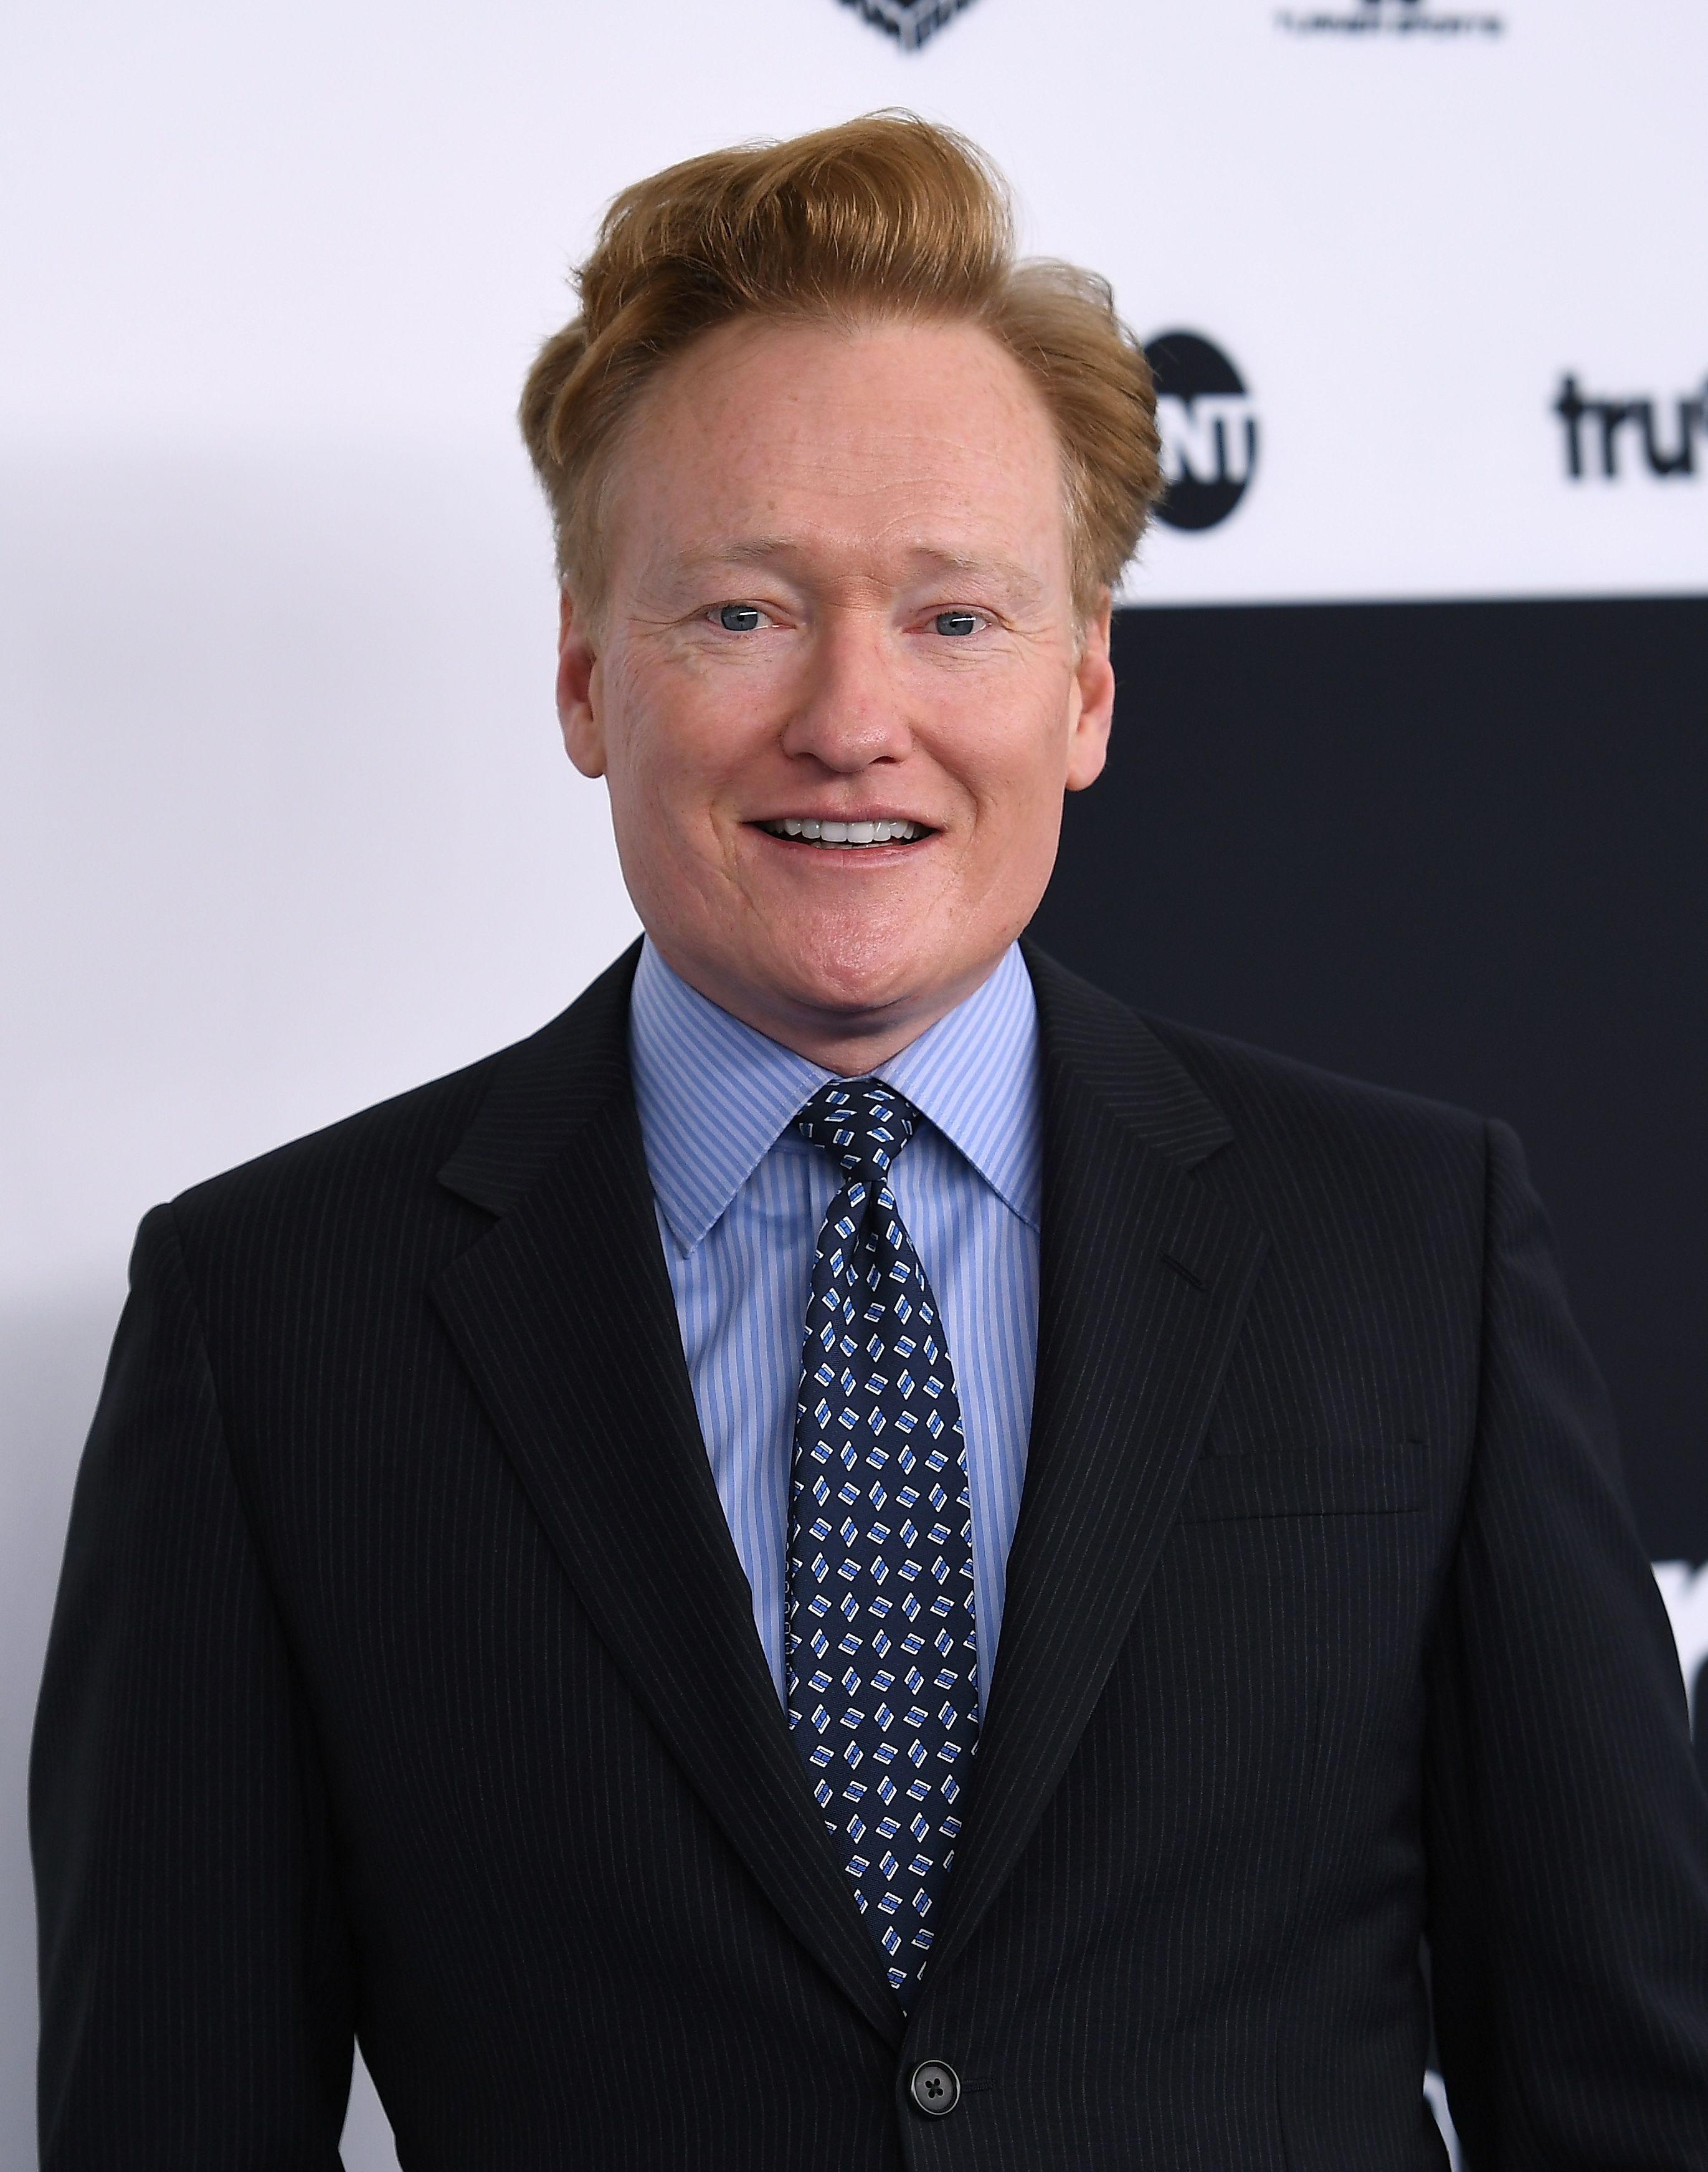 Jimmy Kimmel, Jimmy Fallon, Conan O'Brien, James Corden on Donald Trump, David Dennison and DJT in Best of Late Night